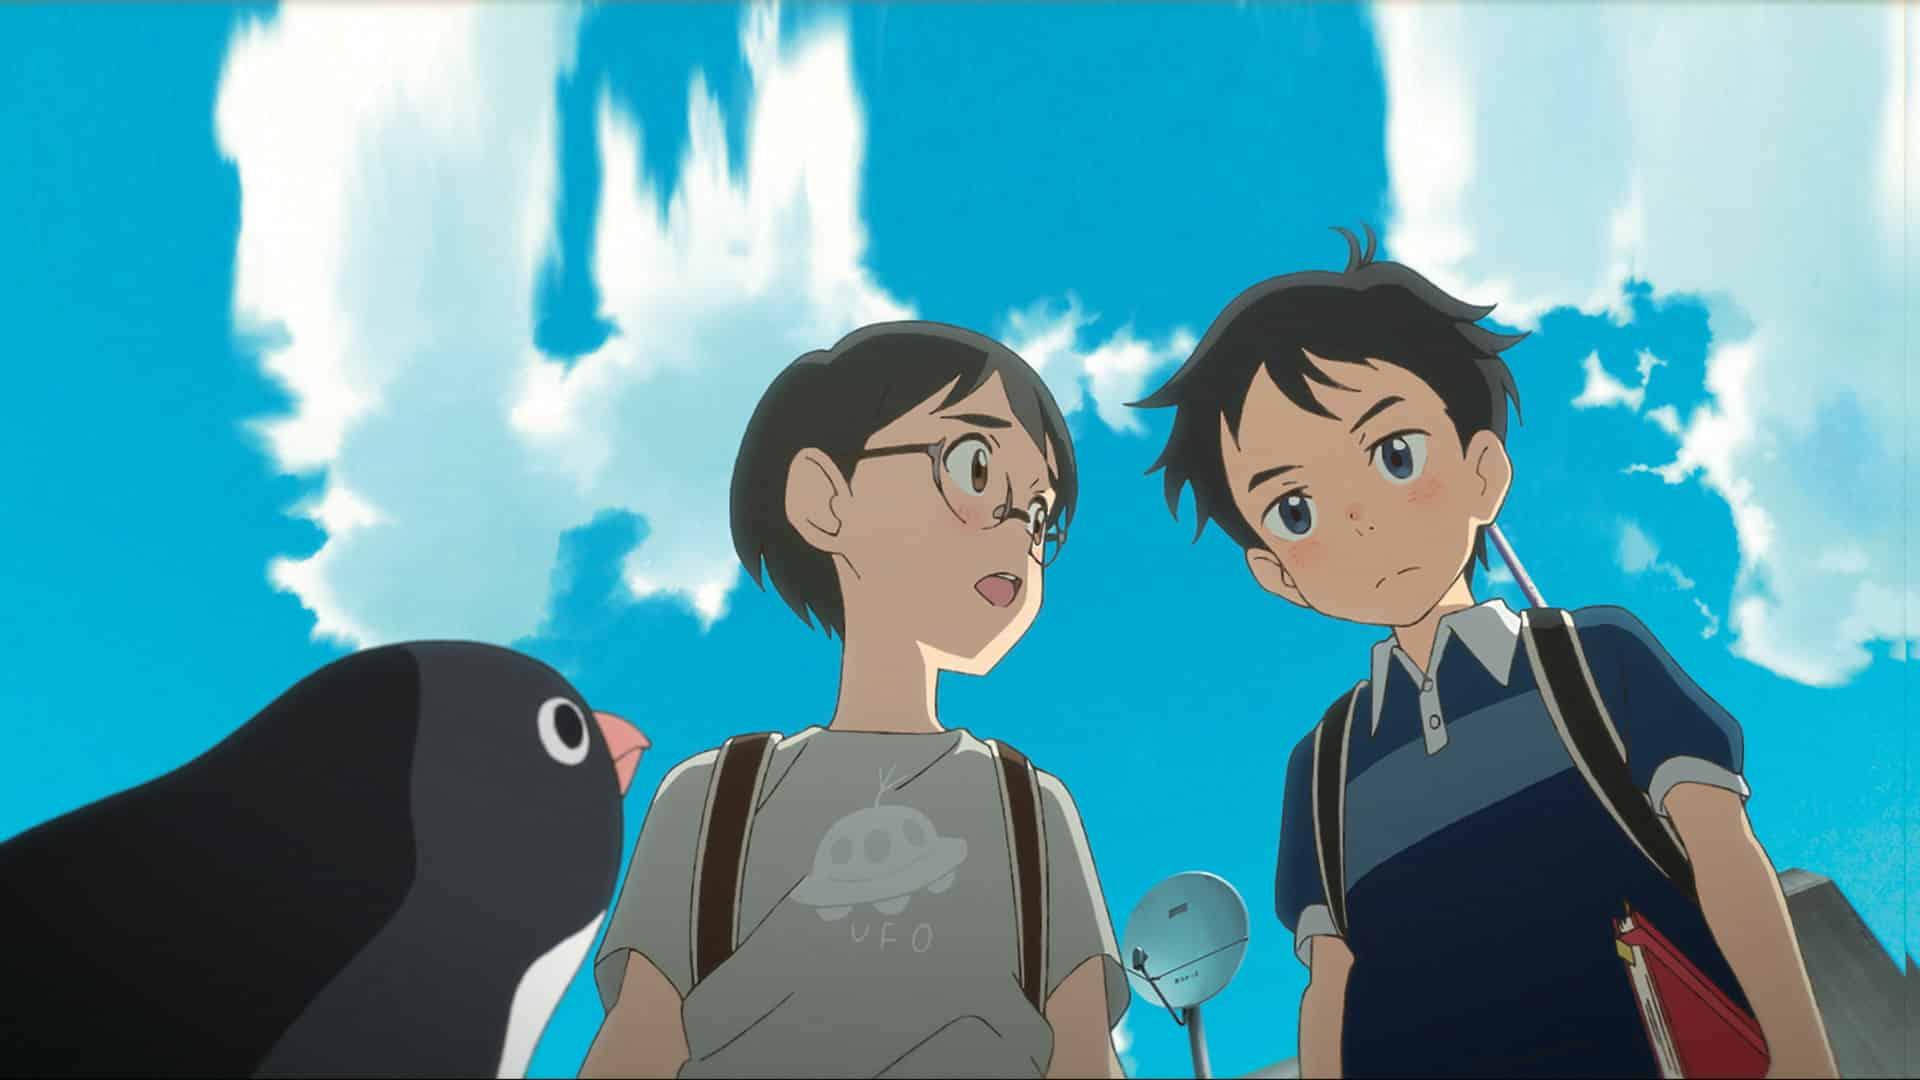 penguin highway film animazione giapponese